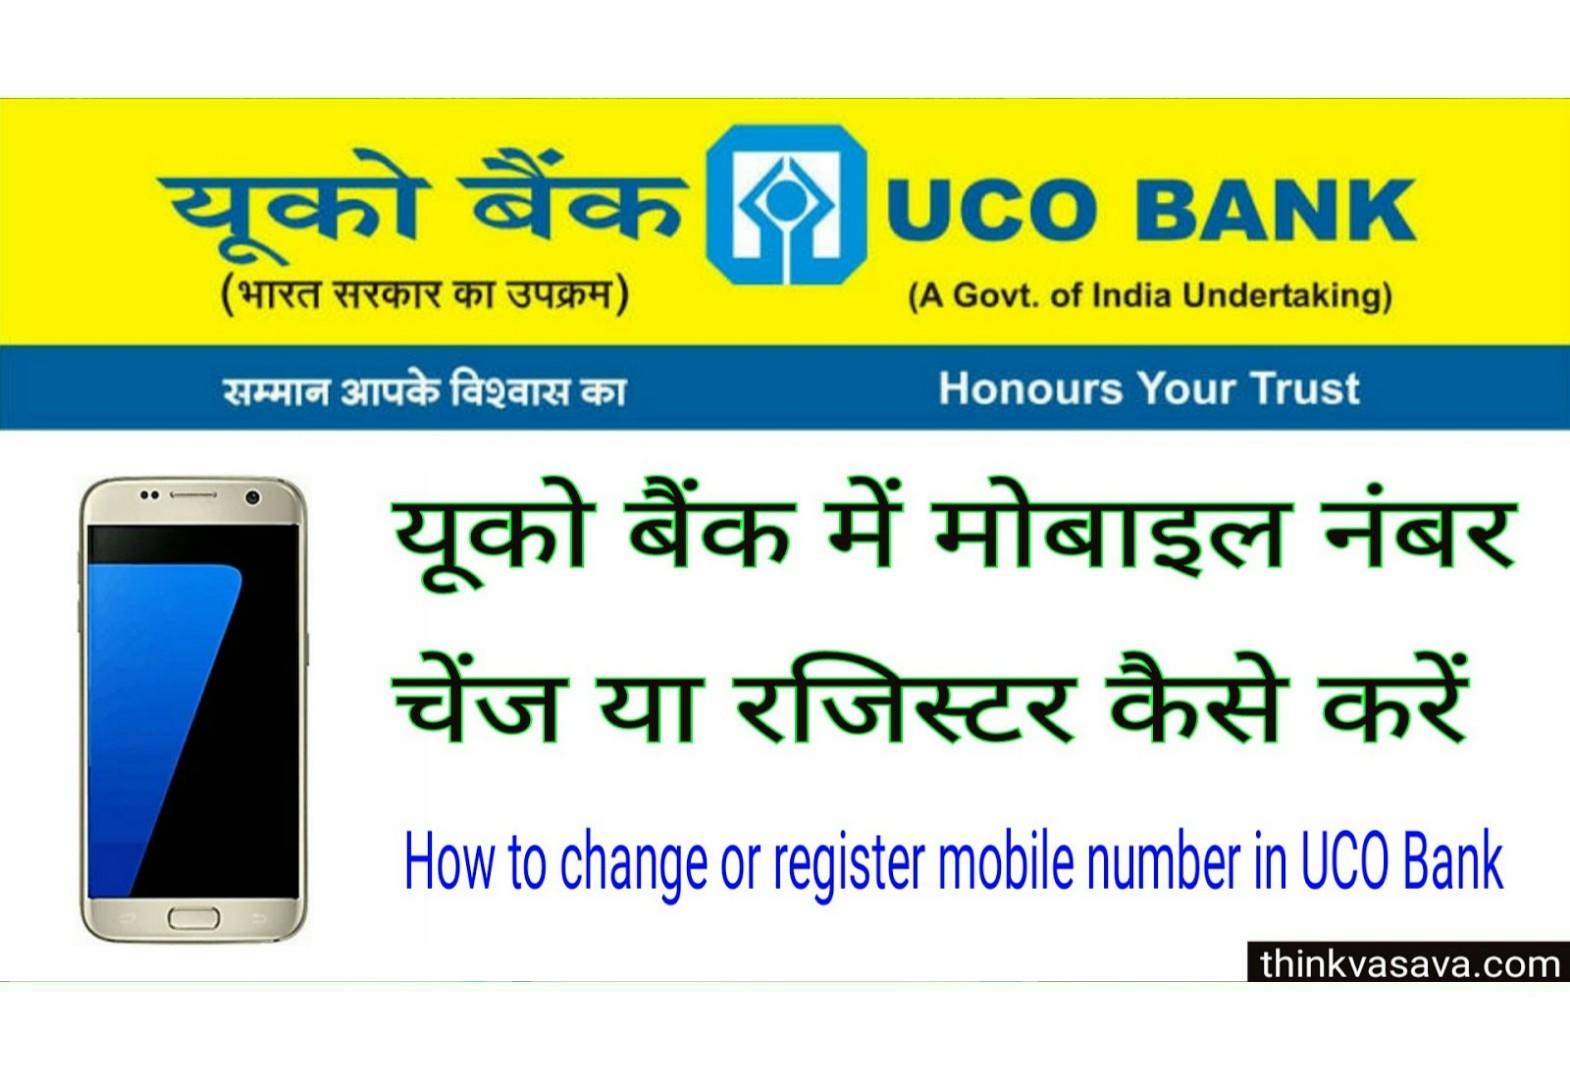 uco mobile banking register